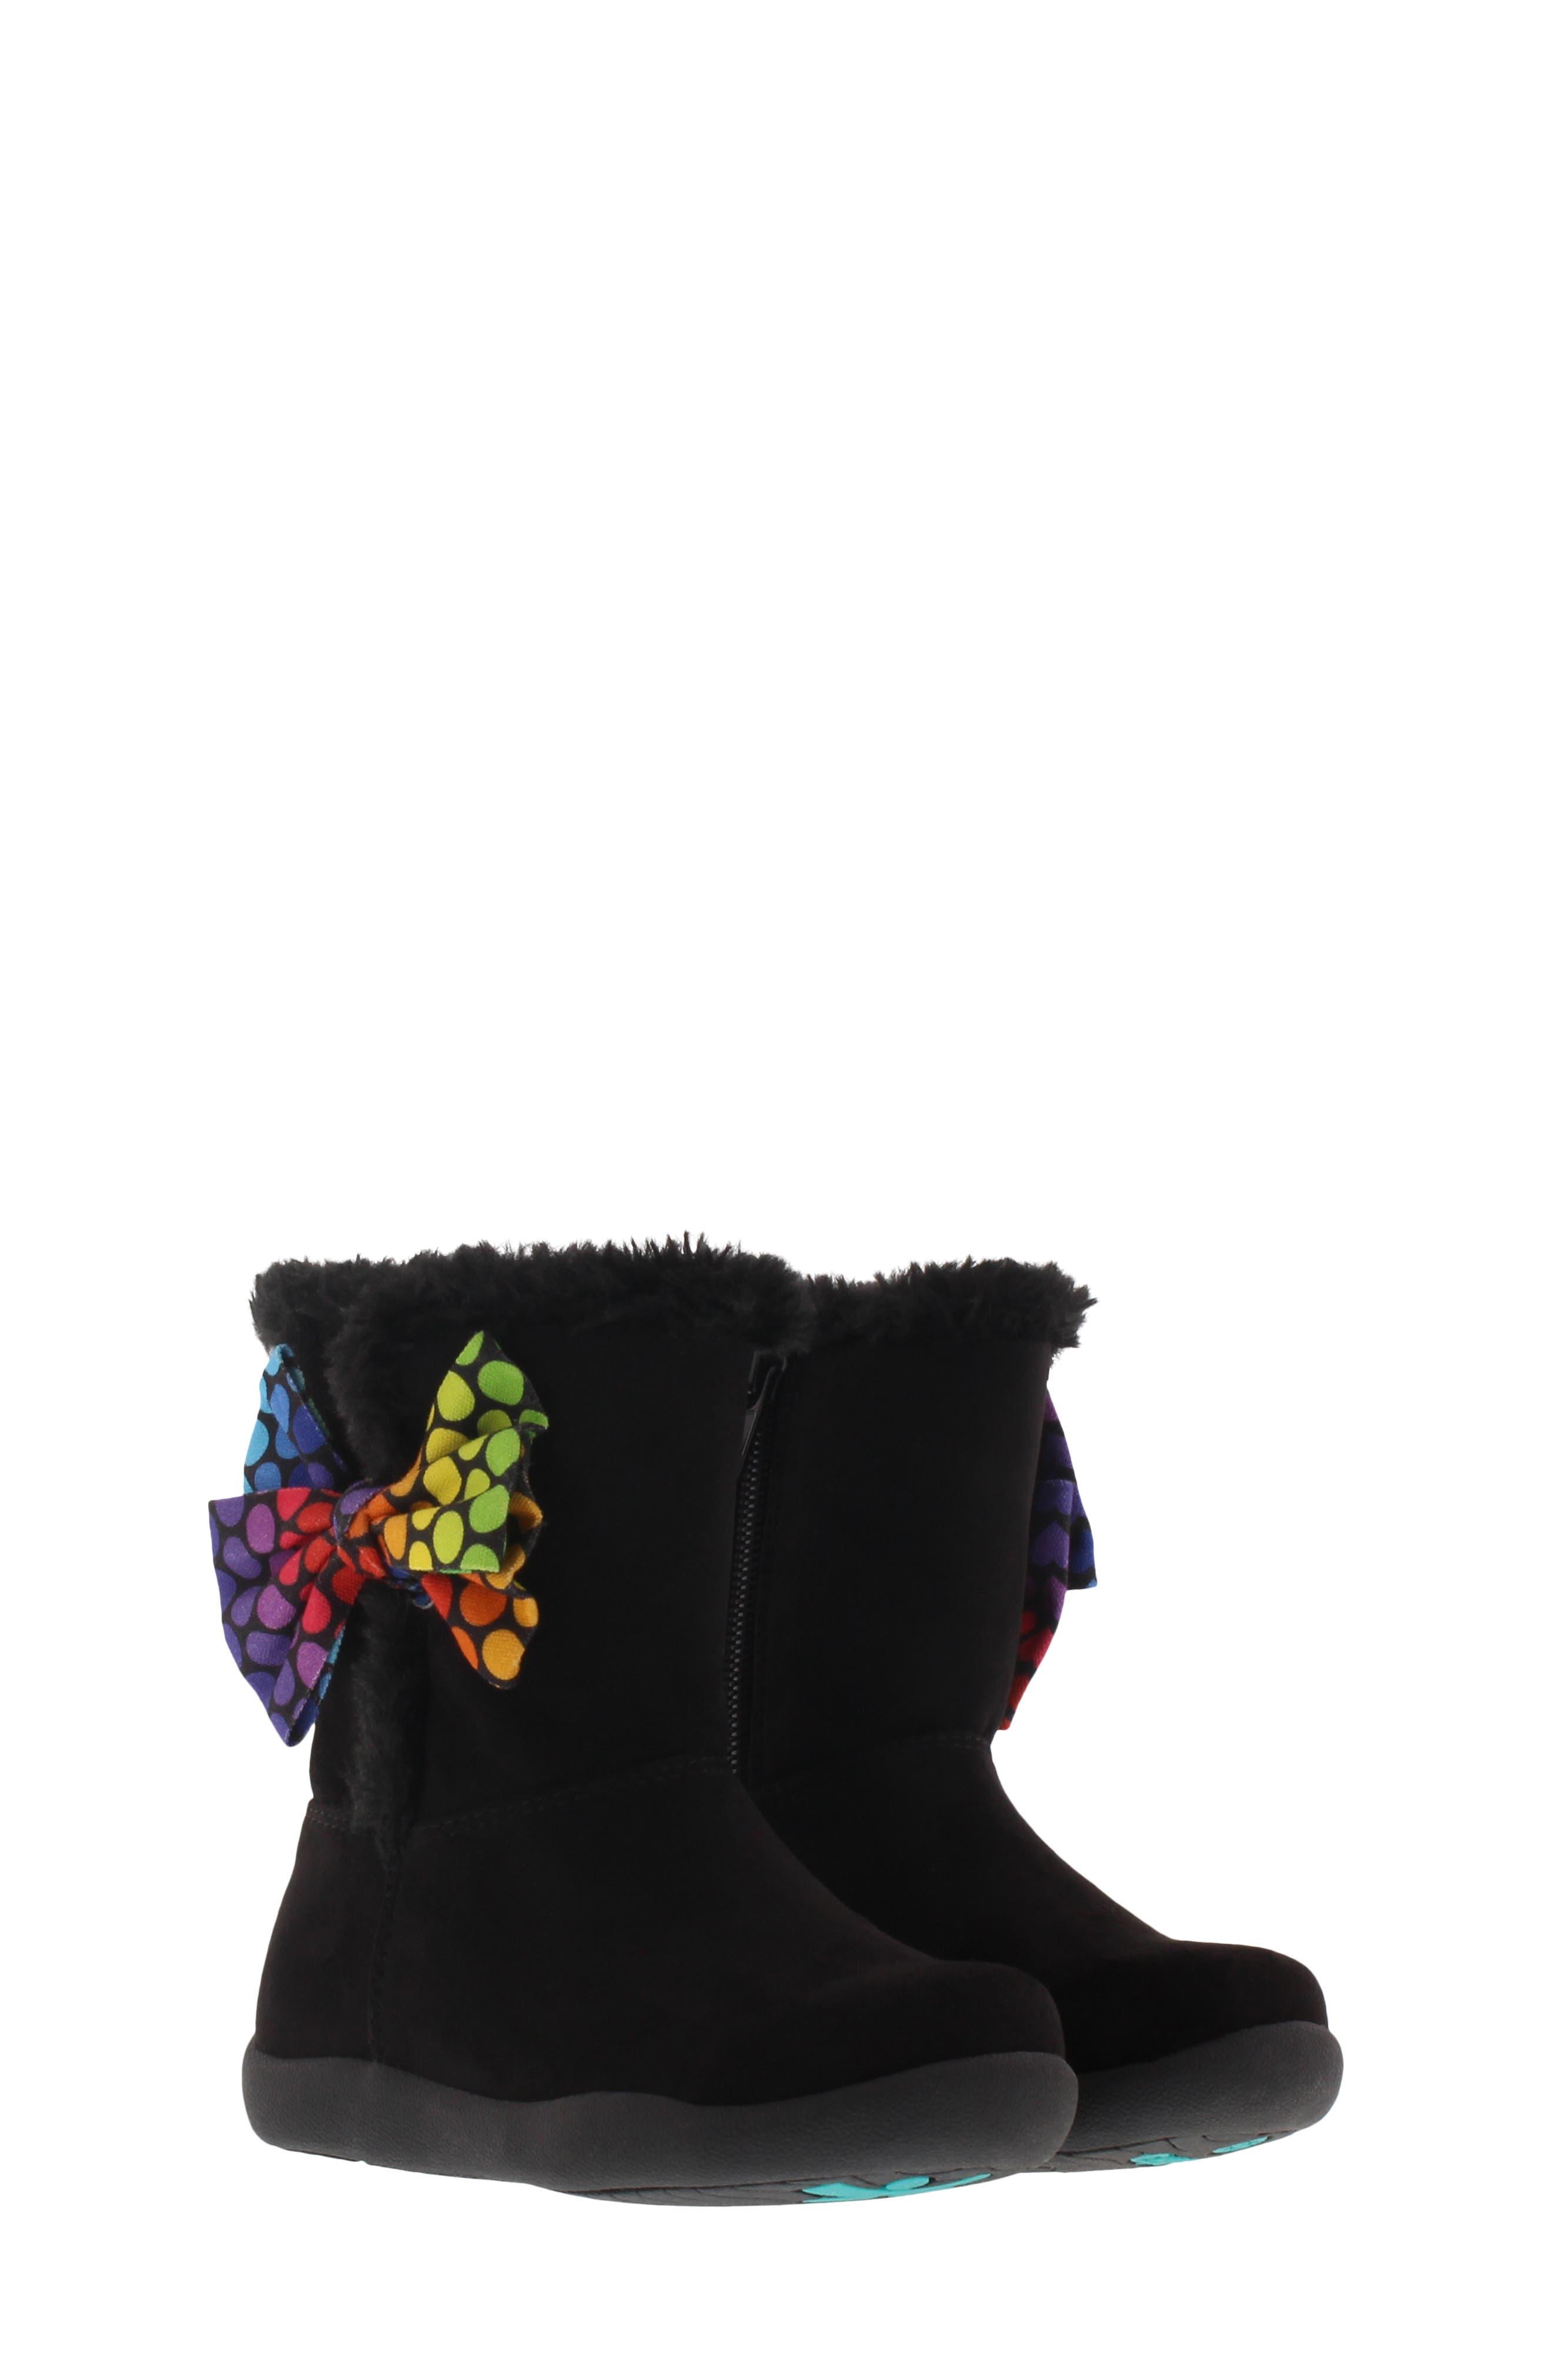 CHOOZE Wish Faux Fur Lined Boot, Main, color, BLACK